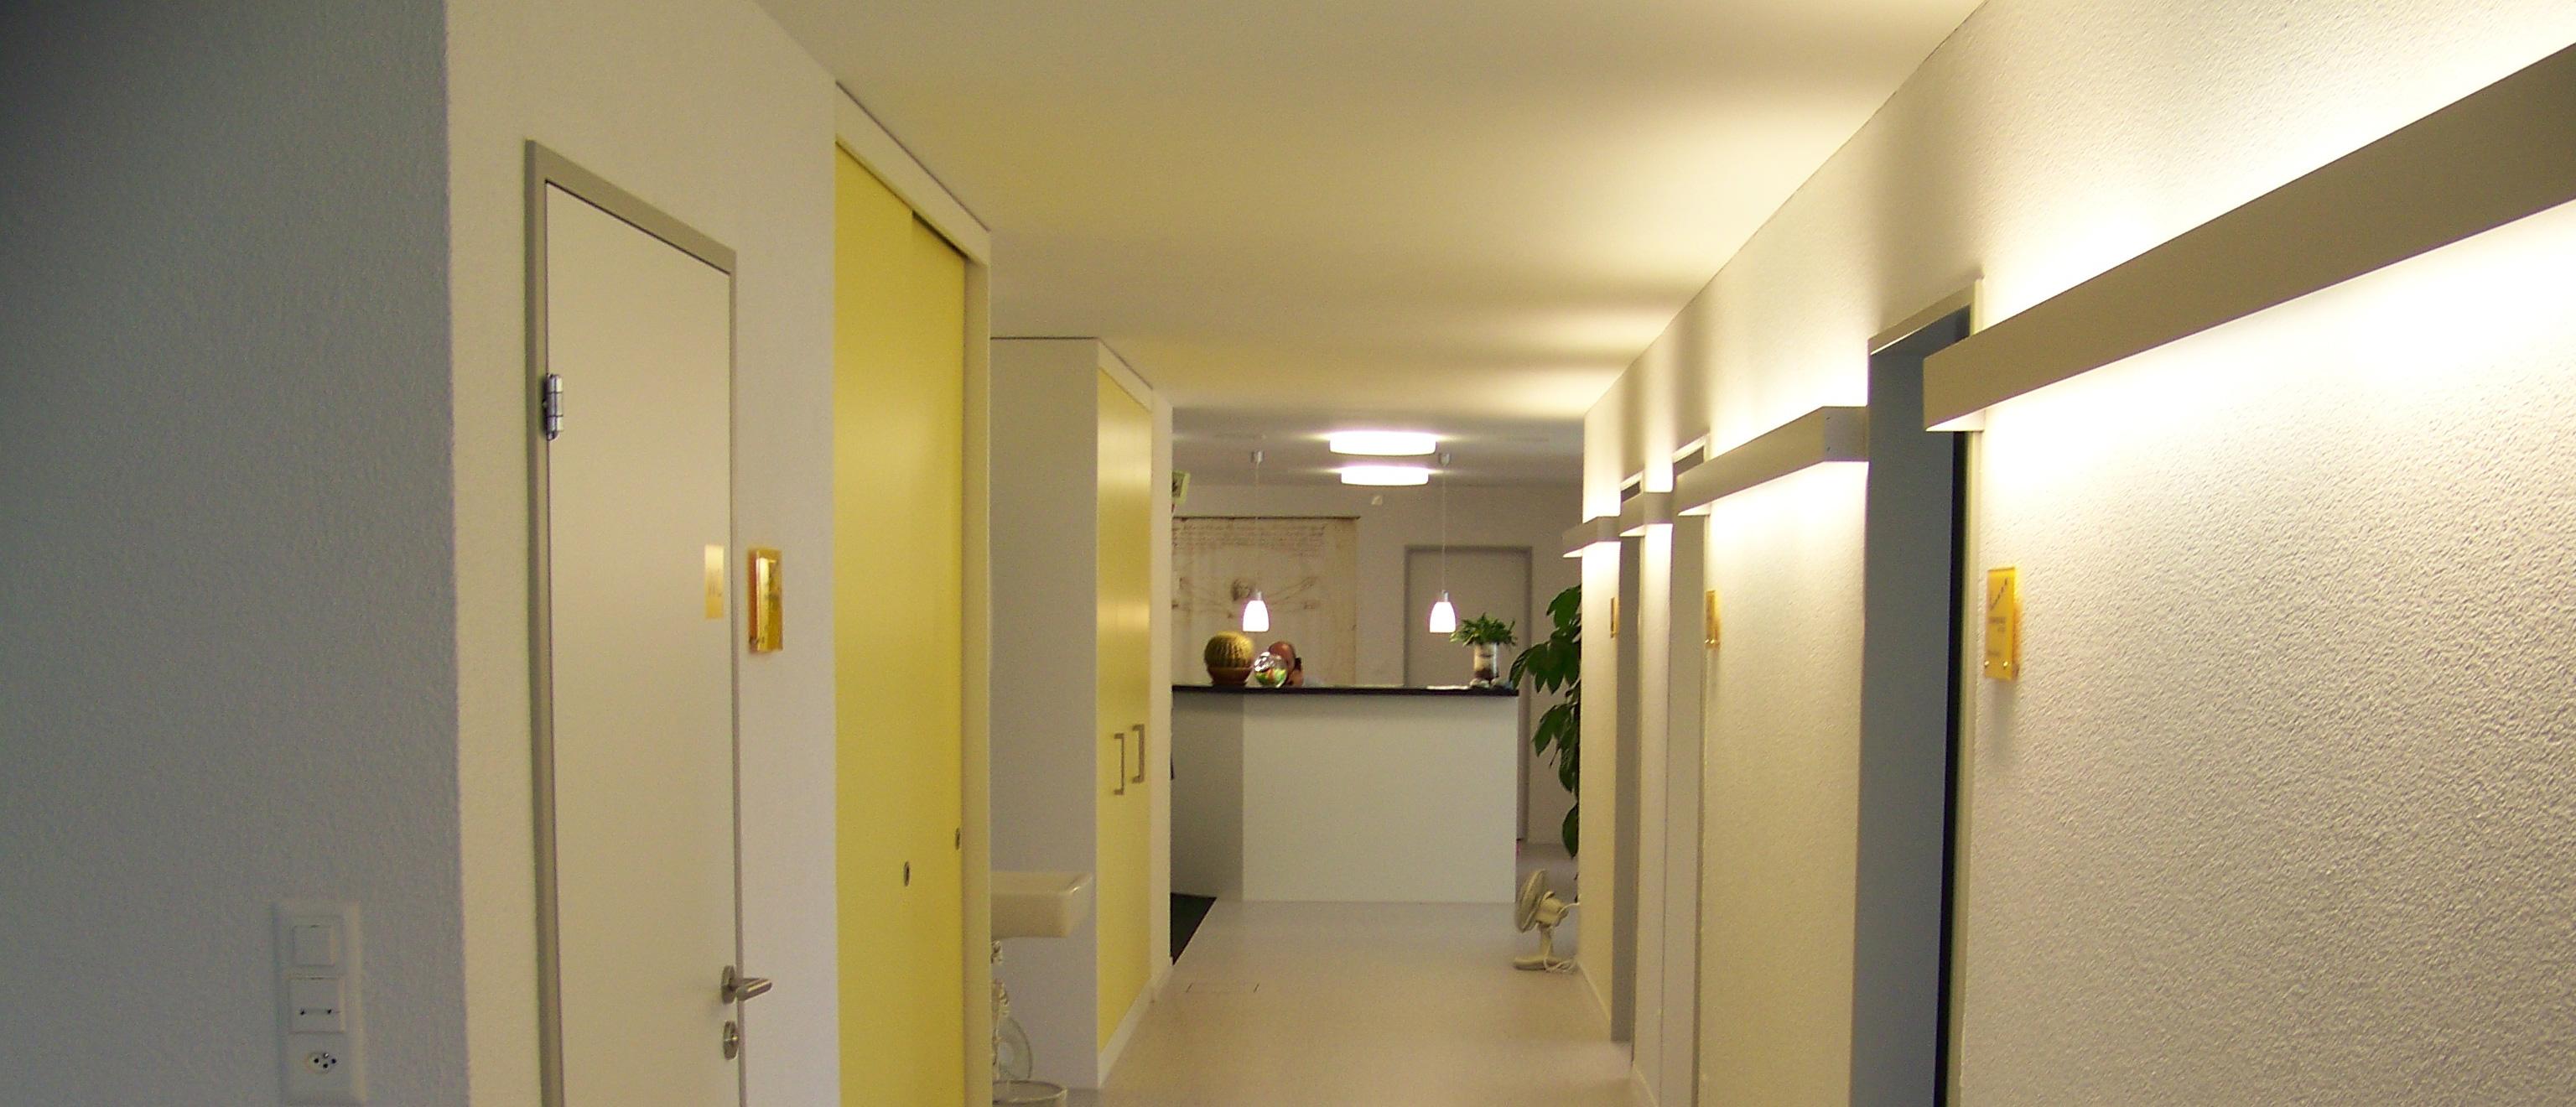 Therapiecenter Gossau